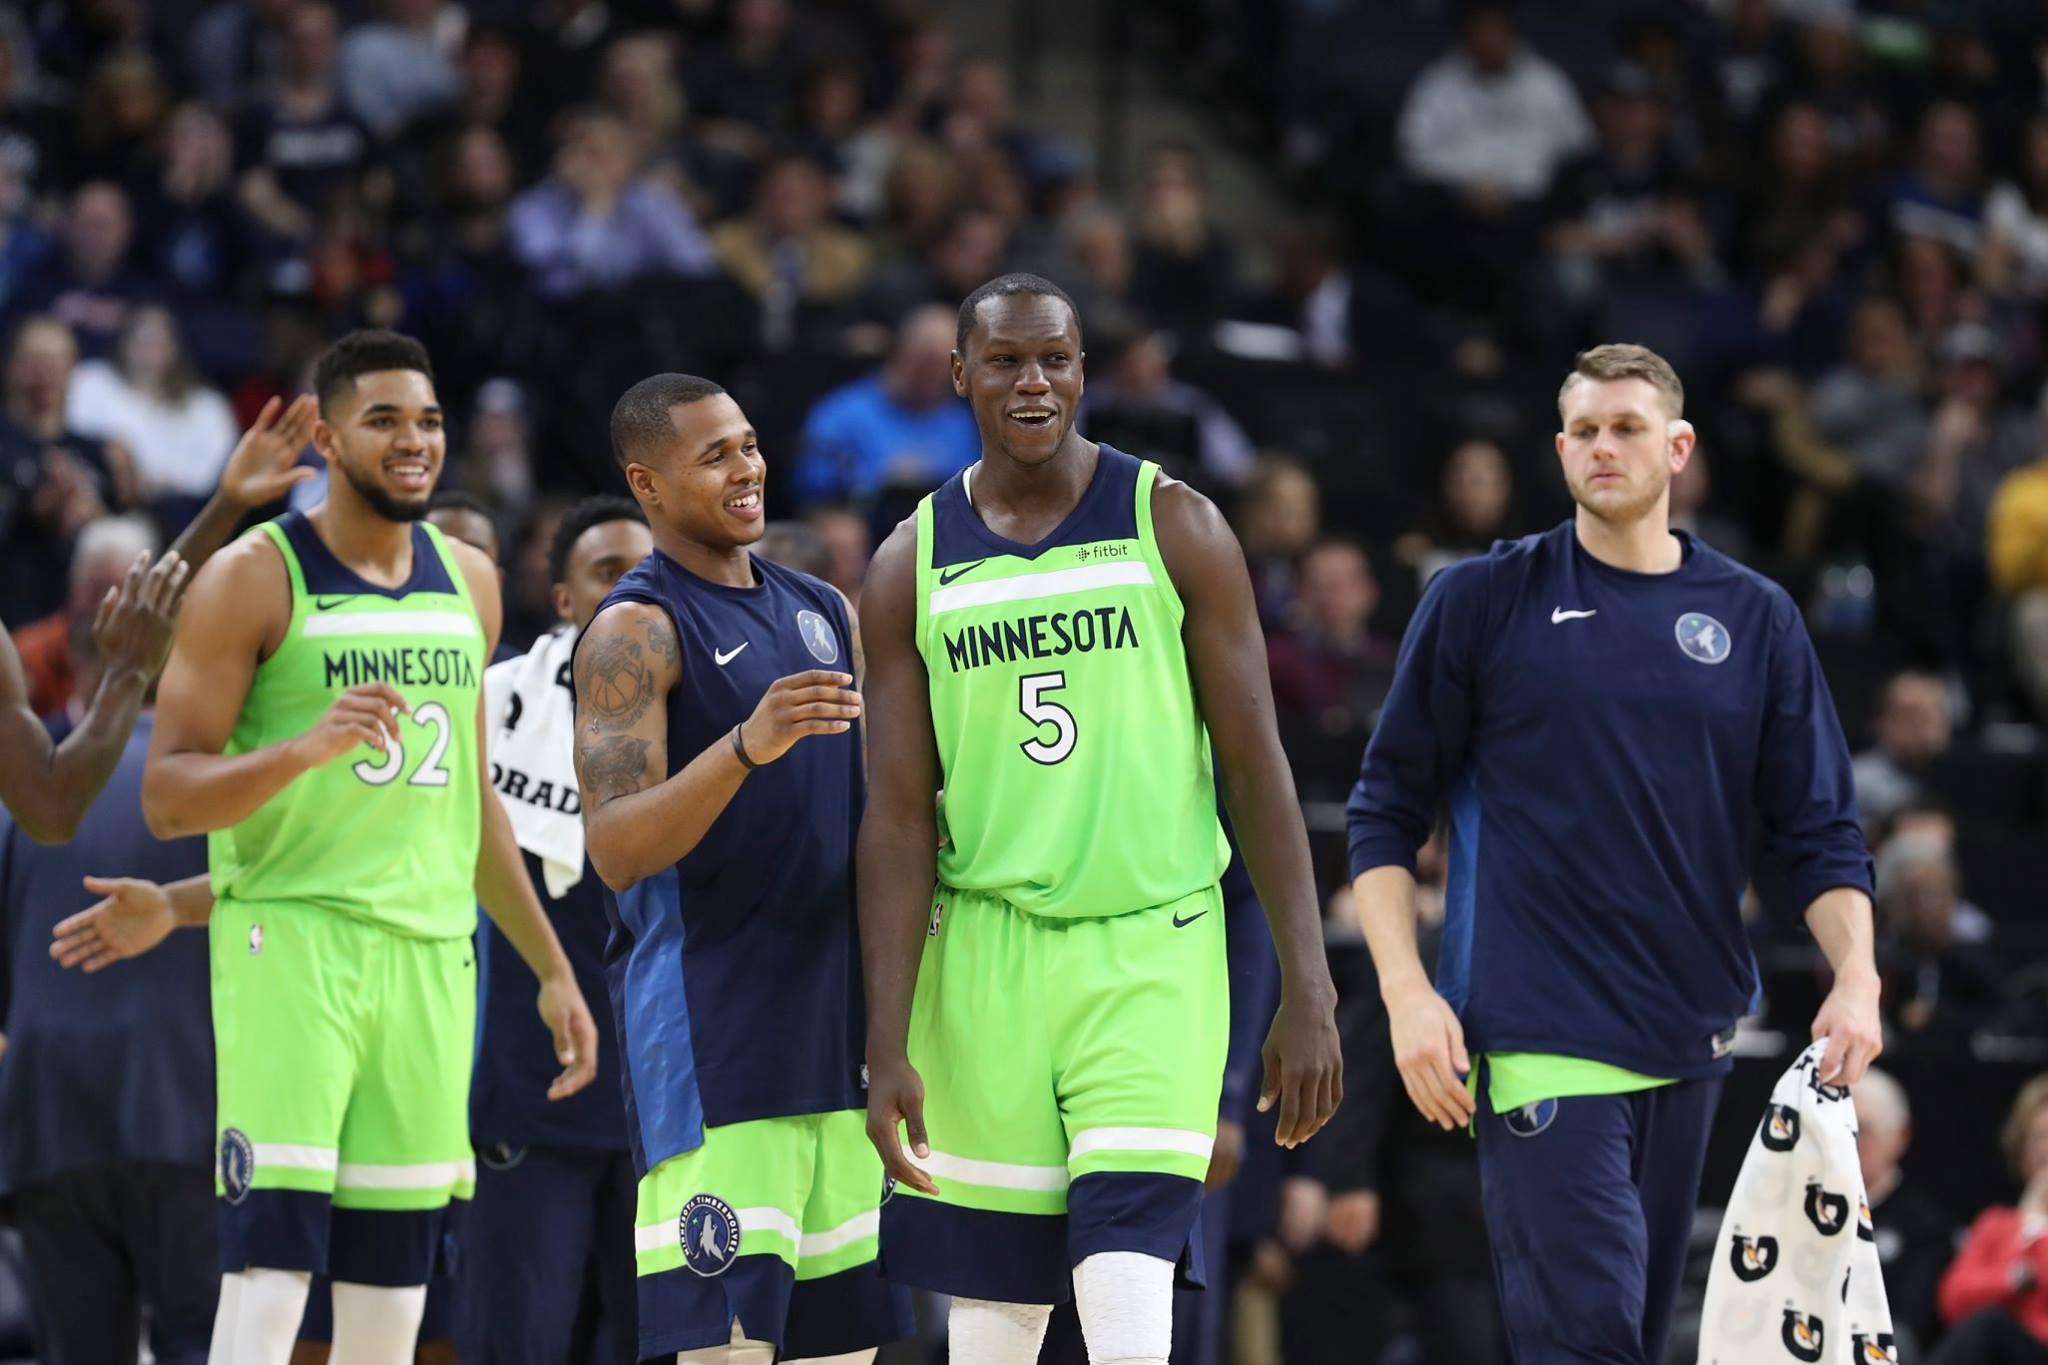 Basket, Gorgui Dieng, match de Gorgui Dieng, Minnesota, Nba, vidéo de Gorgui Dieng, volves